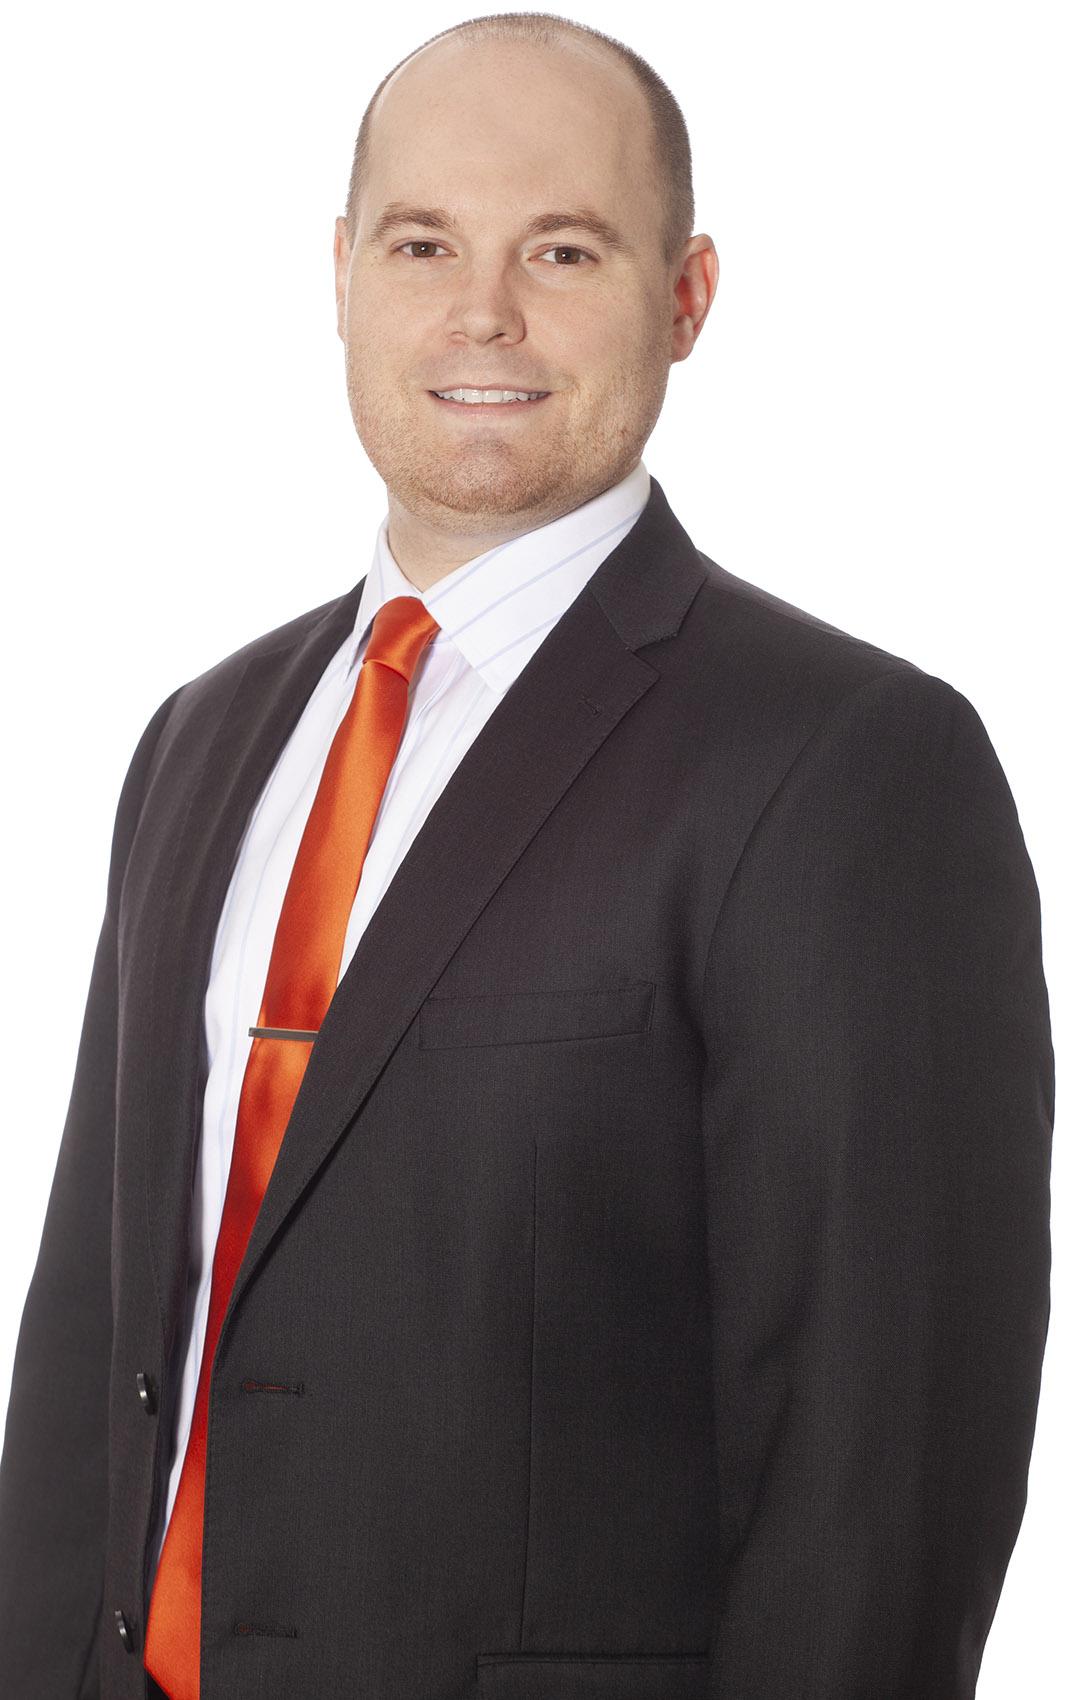 Nathaniel G. Dutt